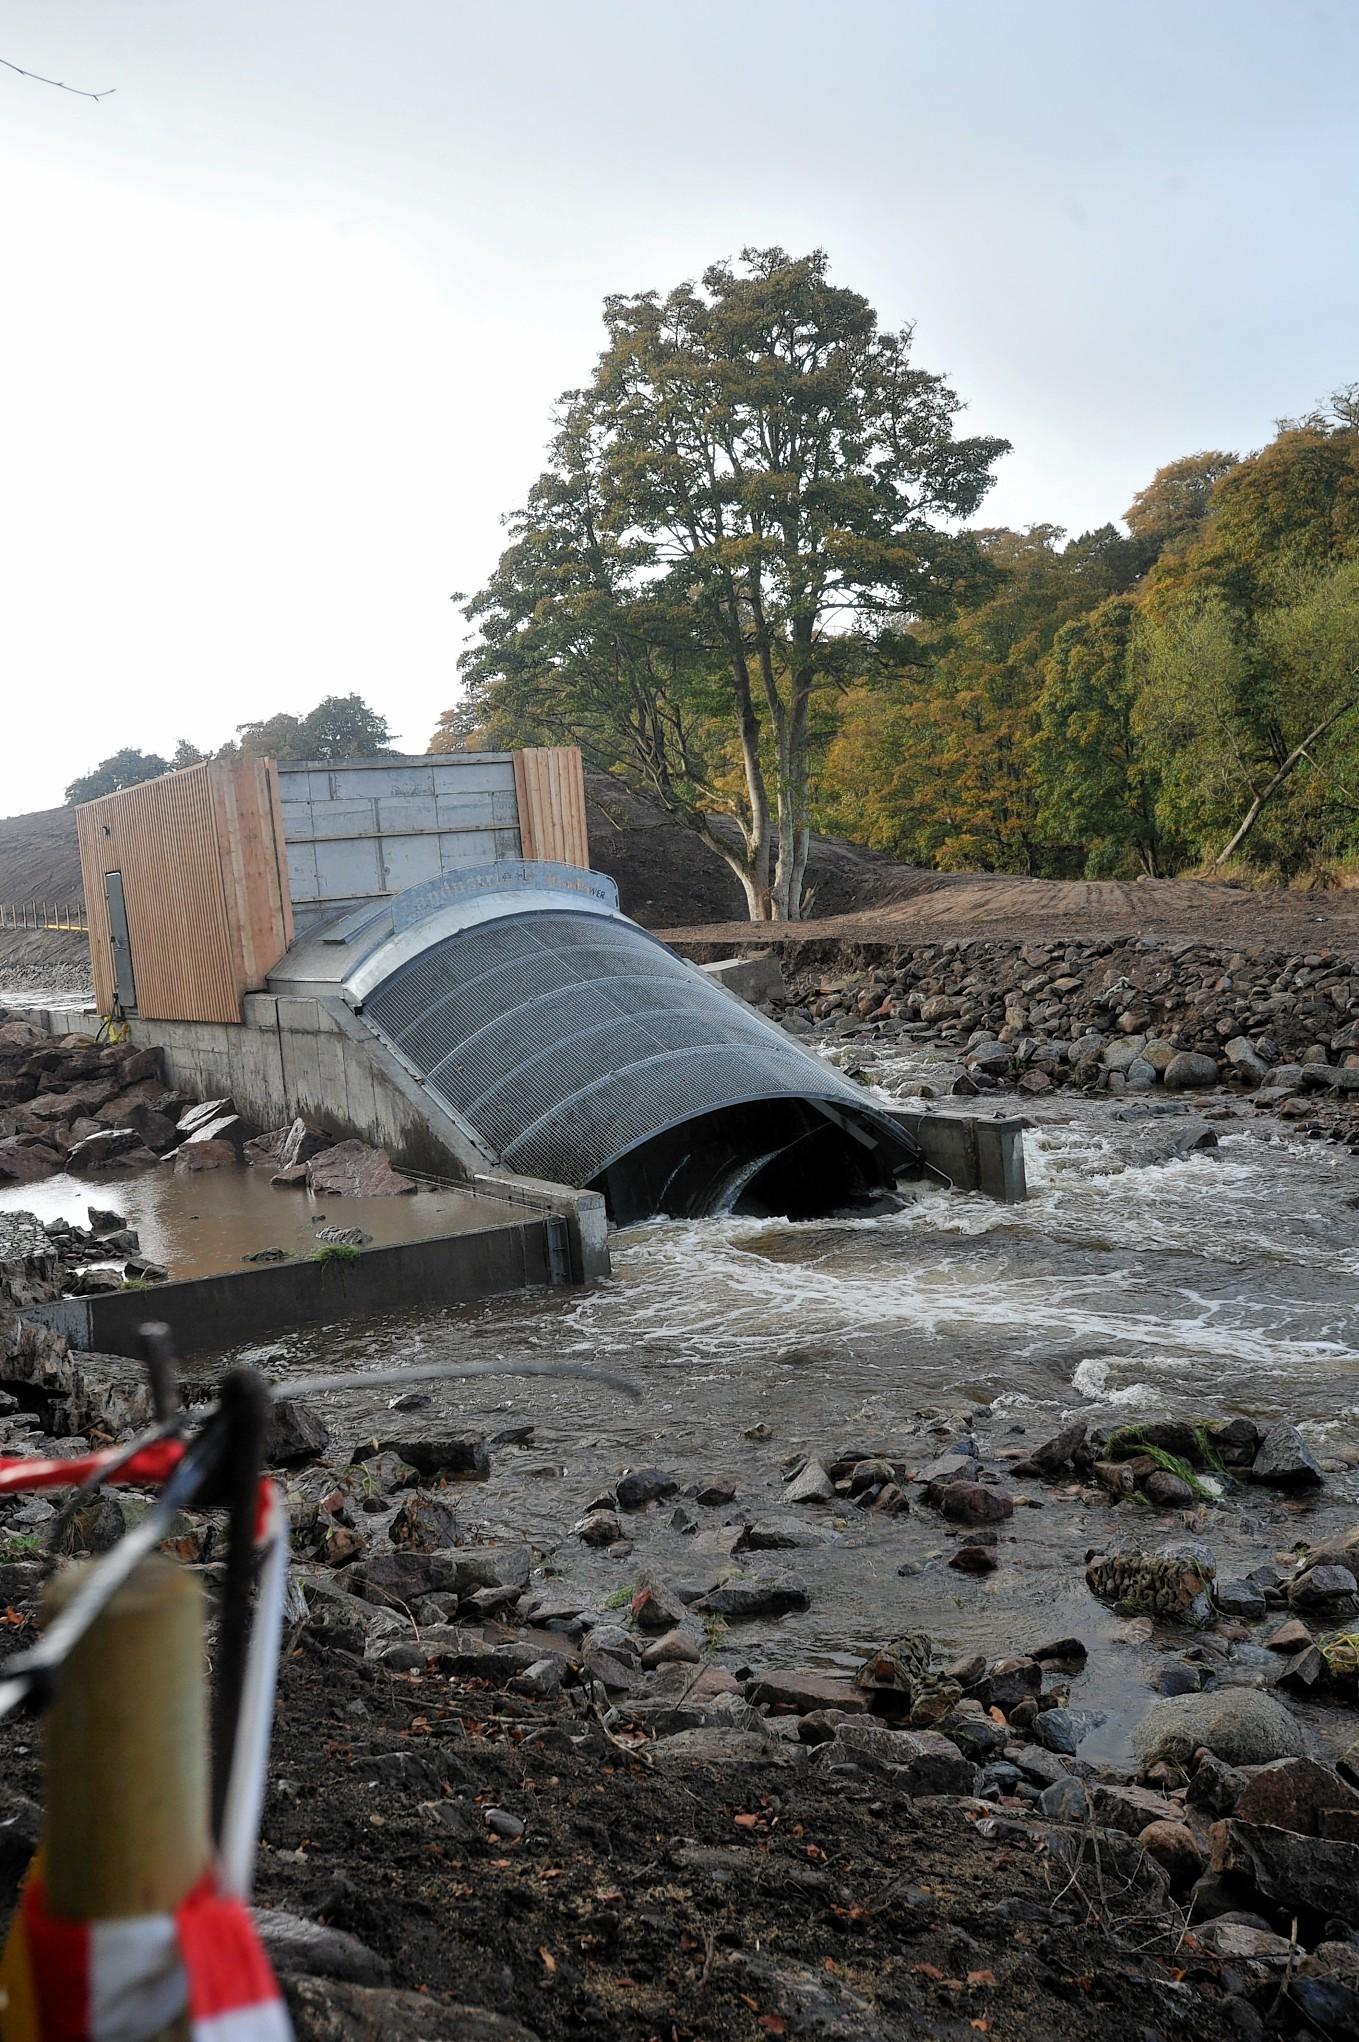 The Donside Hydro scheme at Tillydrone, Aberdeen.